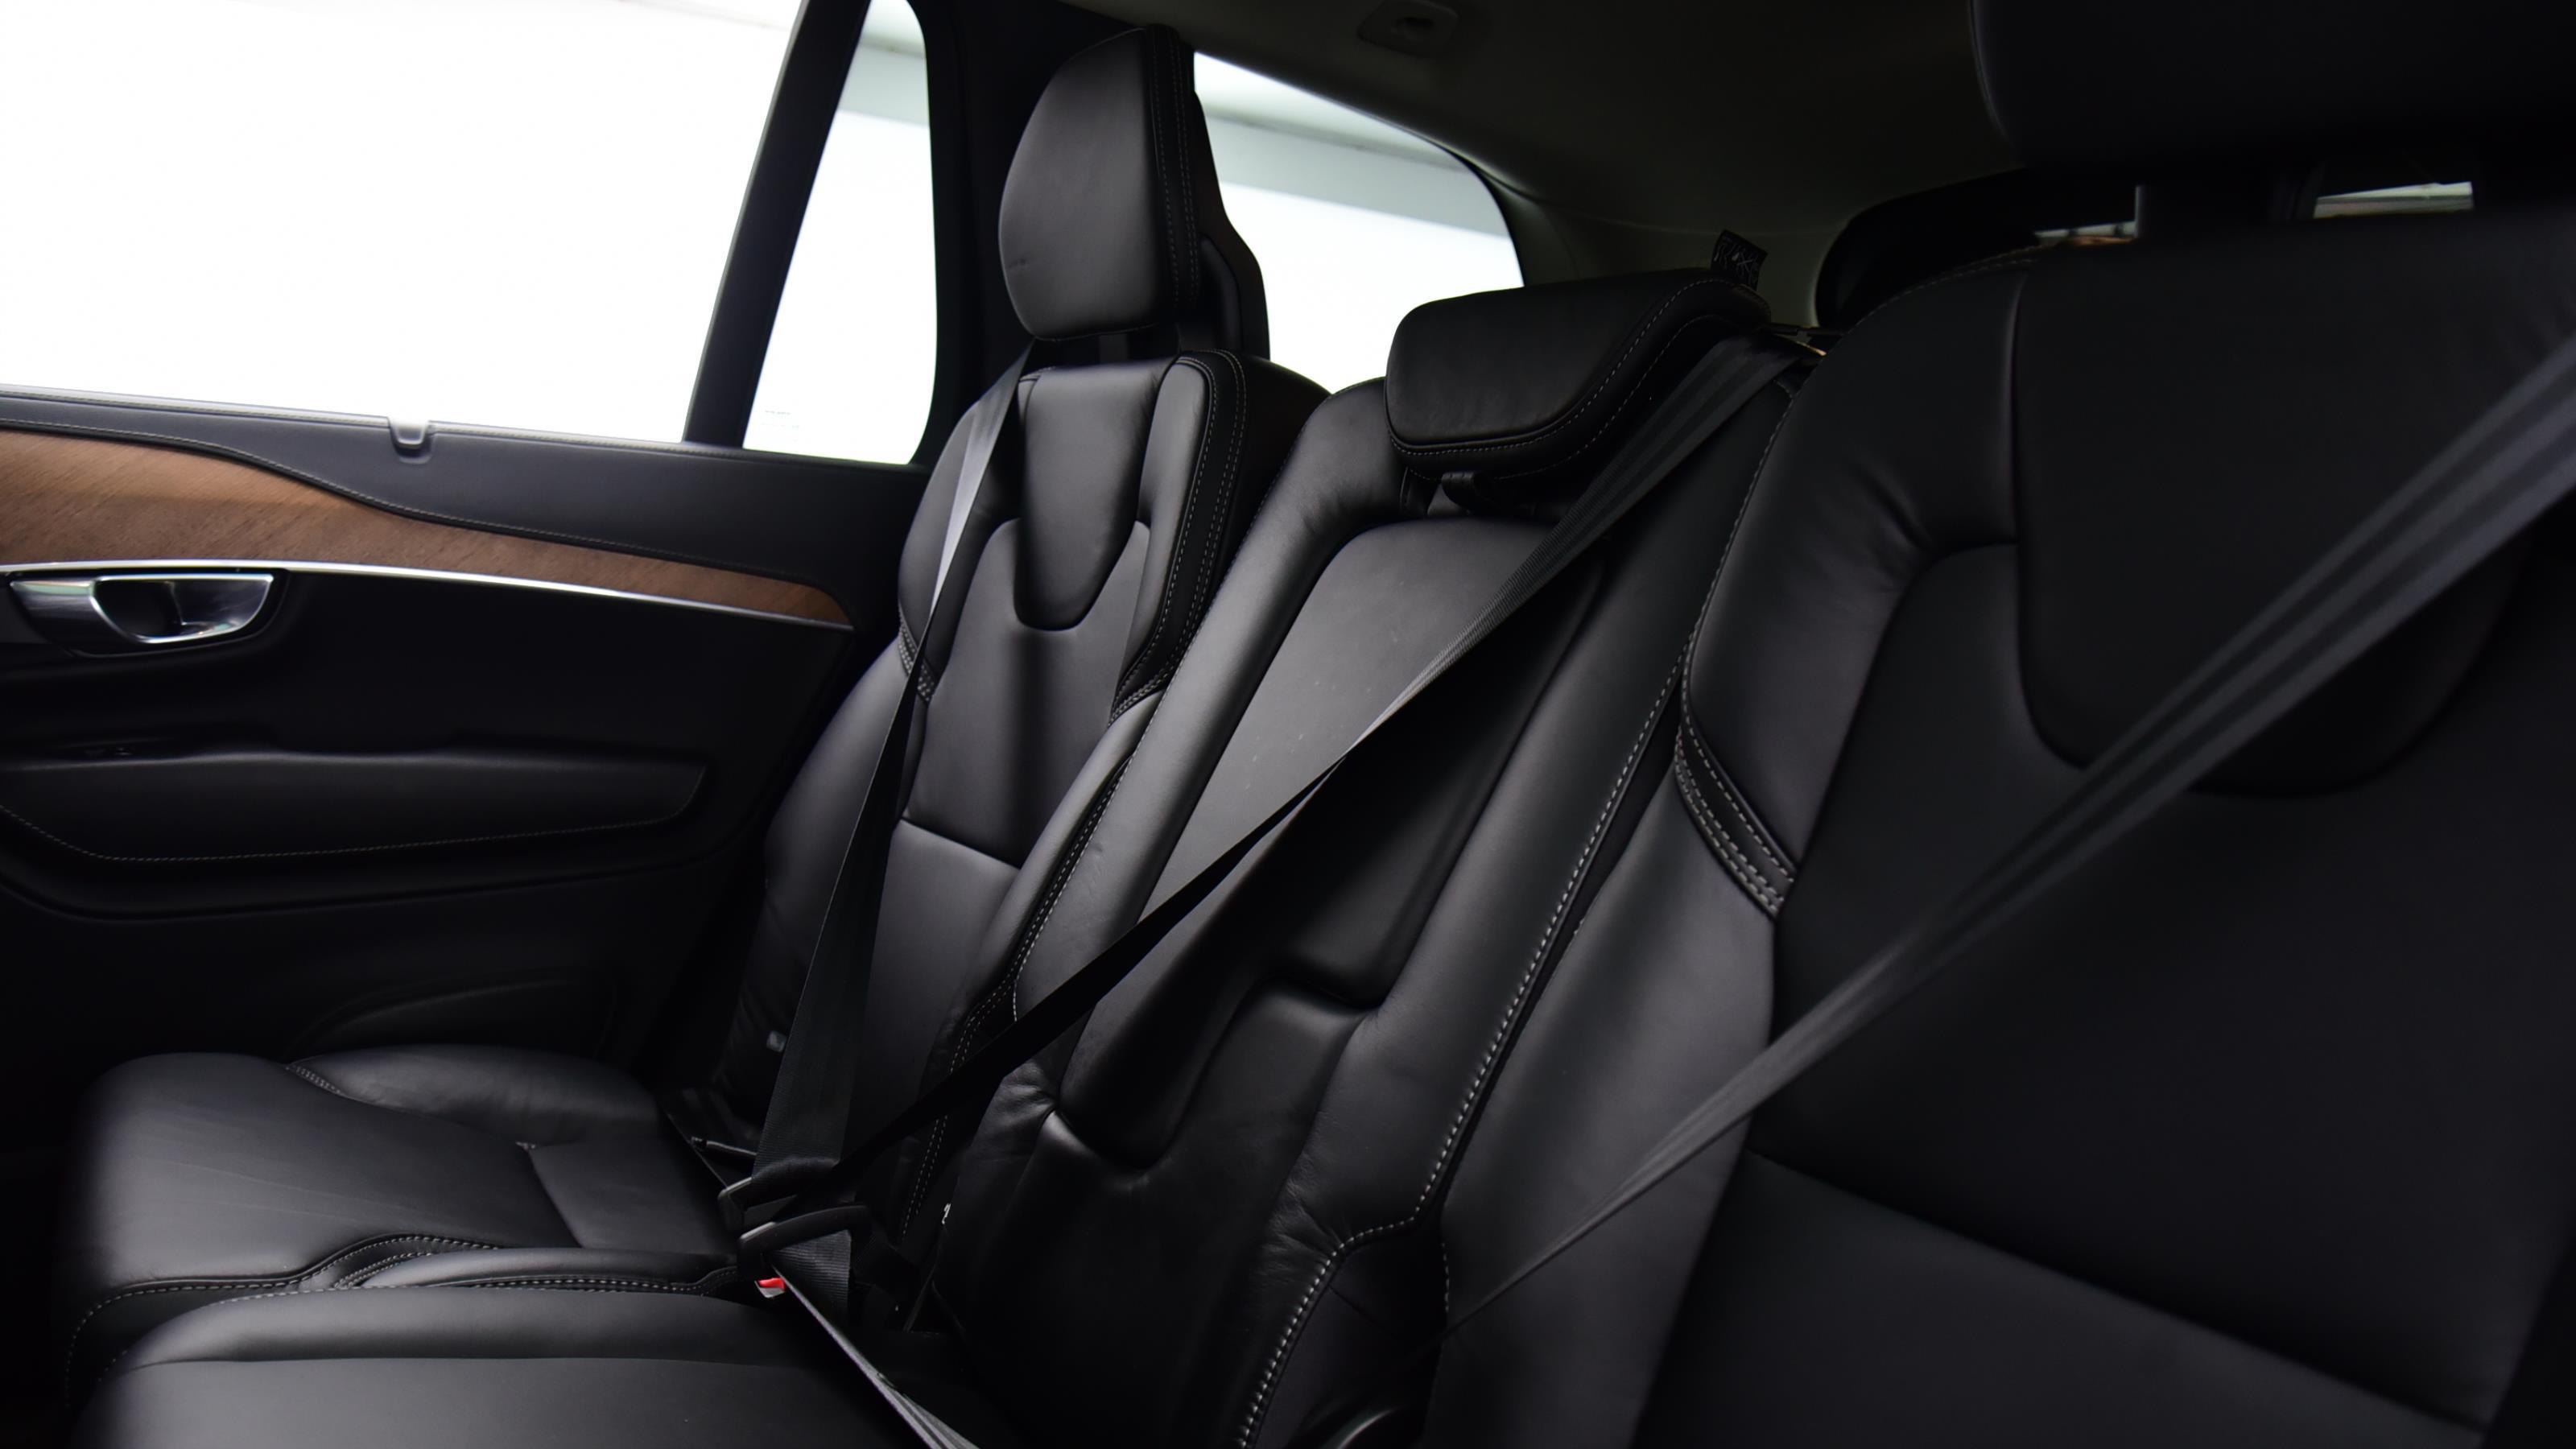 Used 2018 Volvo XC90 2.0 T8 [390] Hybrid Inscription 5dr AWD Gtron BLACK at Saxton4x4